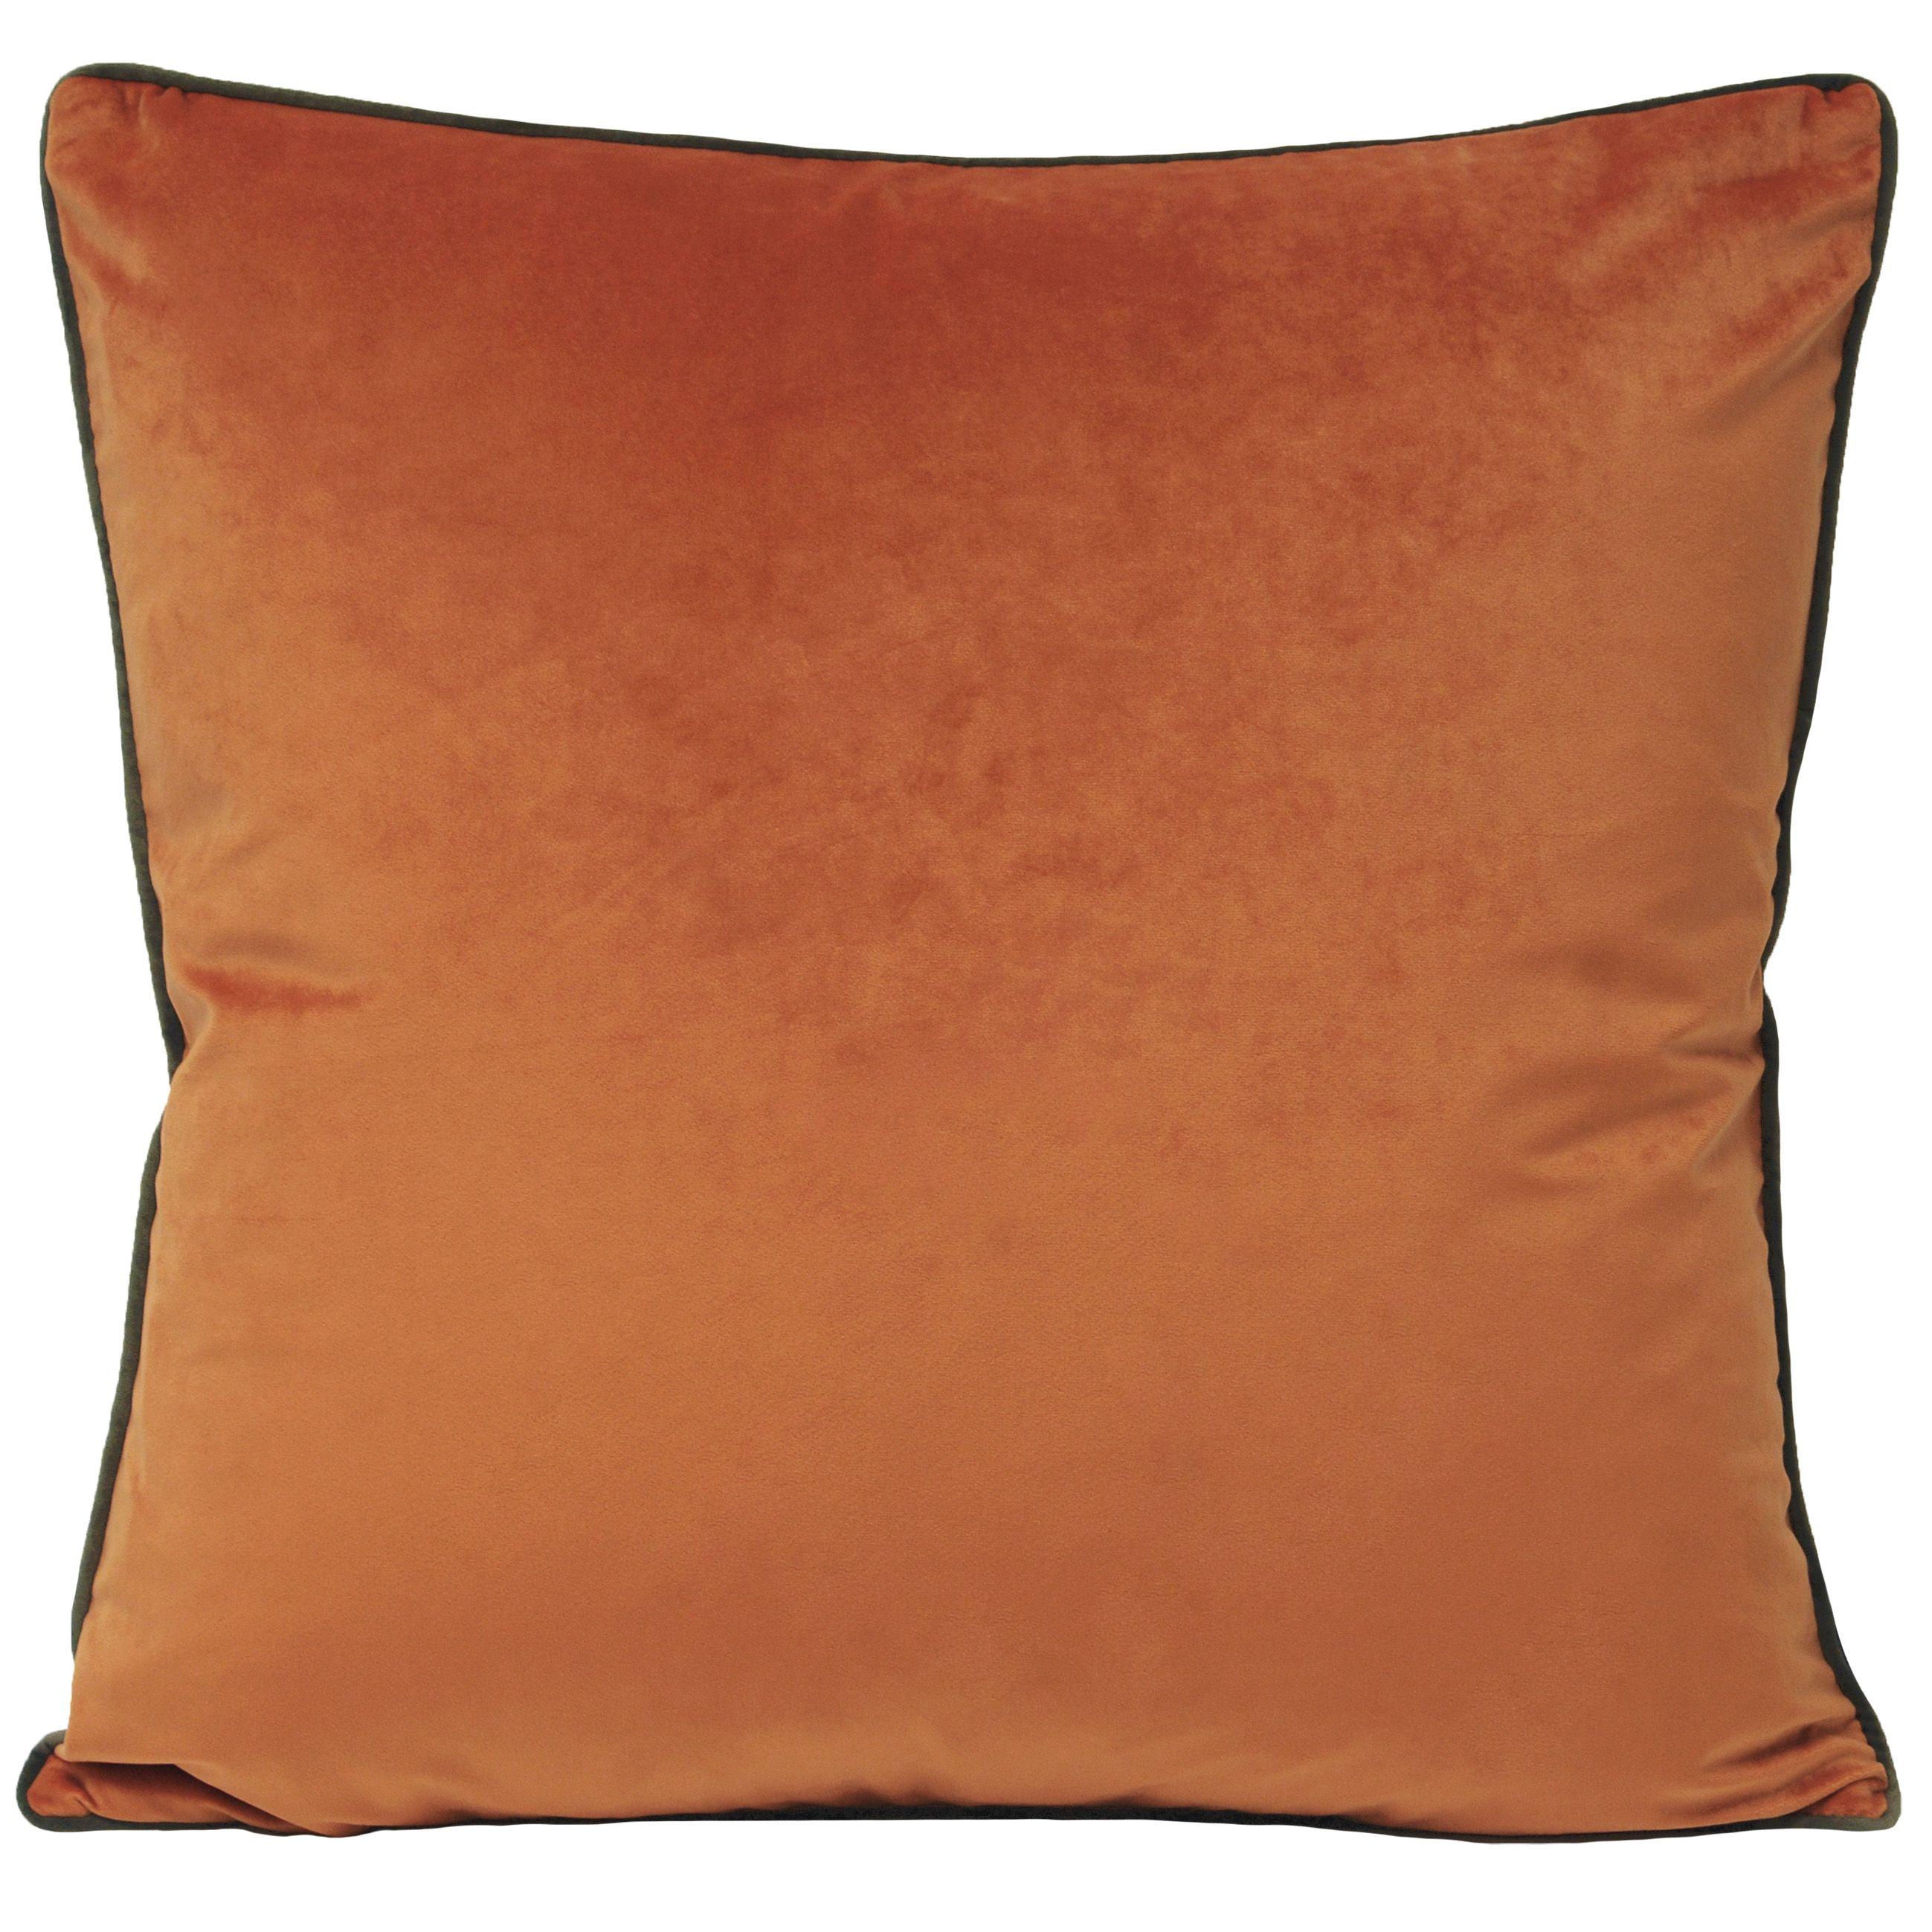 Meridian 55X55 Poly Cushion Pum/Moc